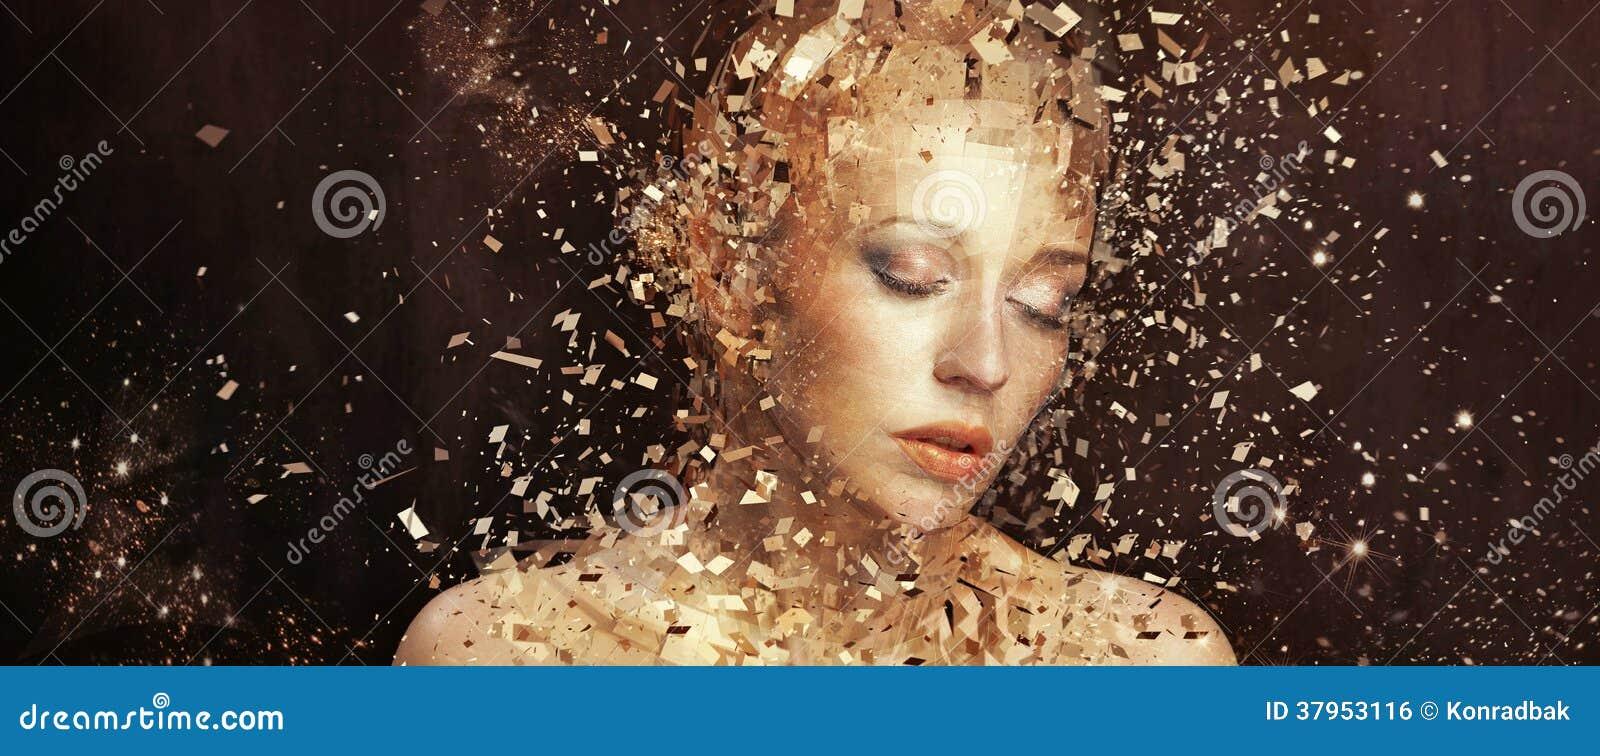 Art photo of golden woman splintering to thousands elements